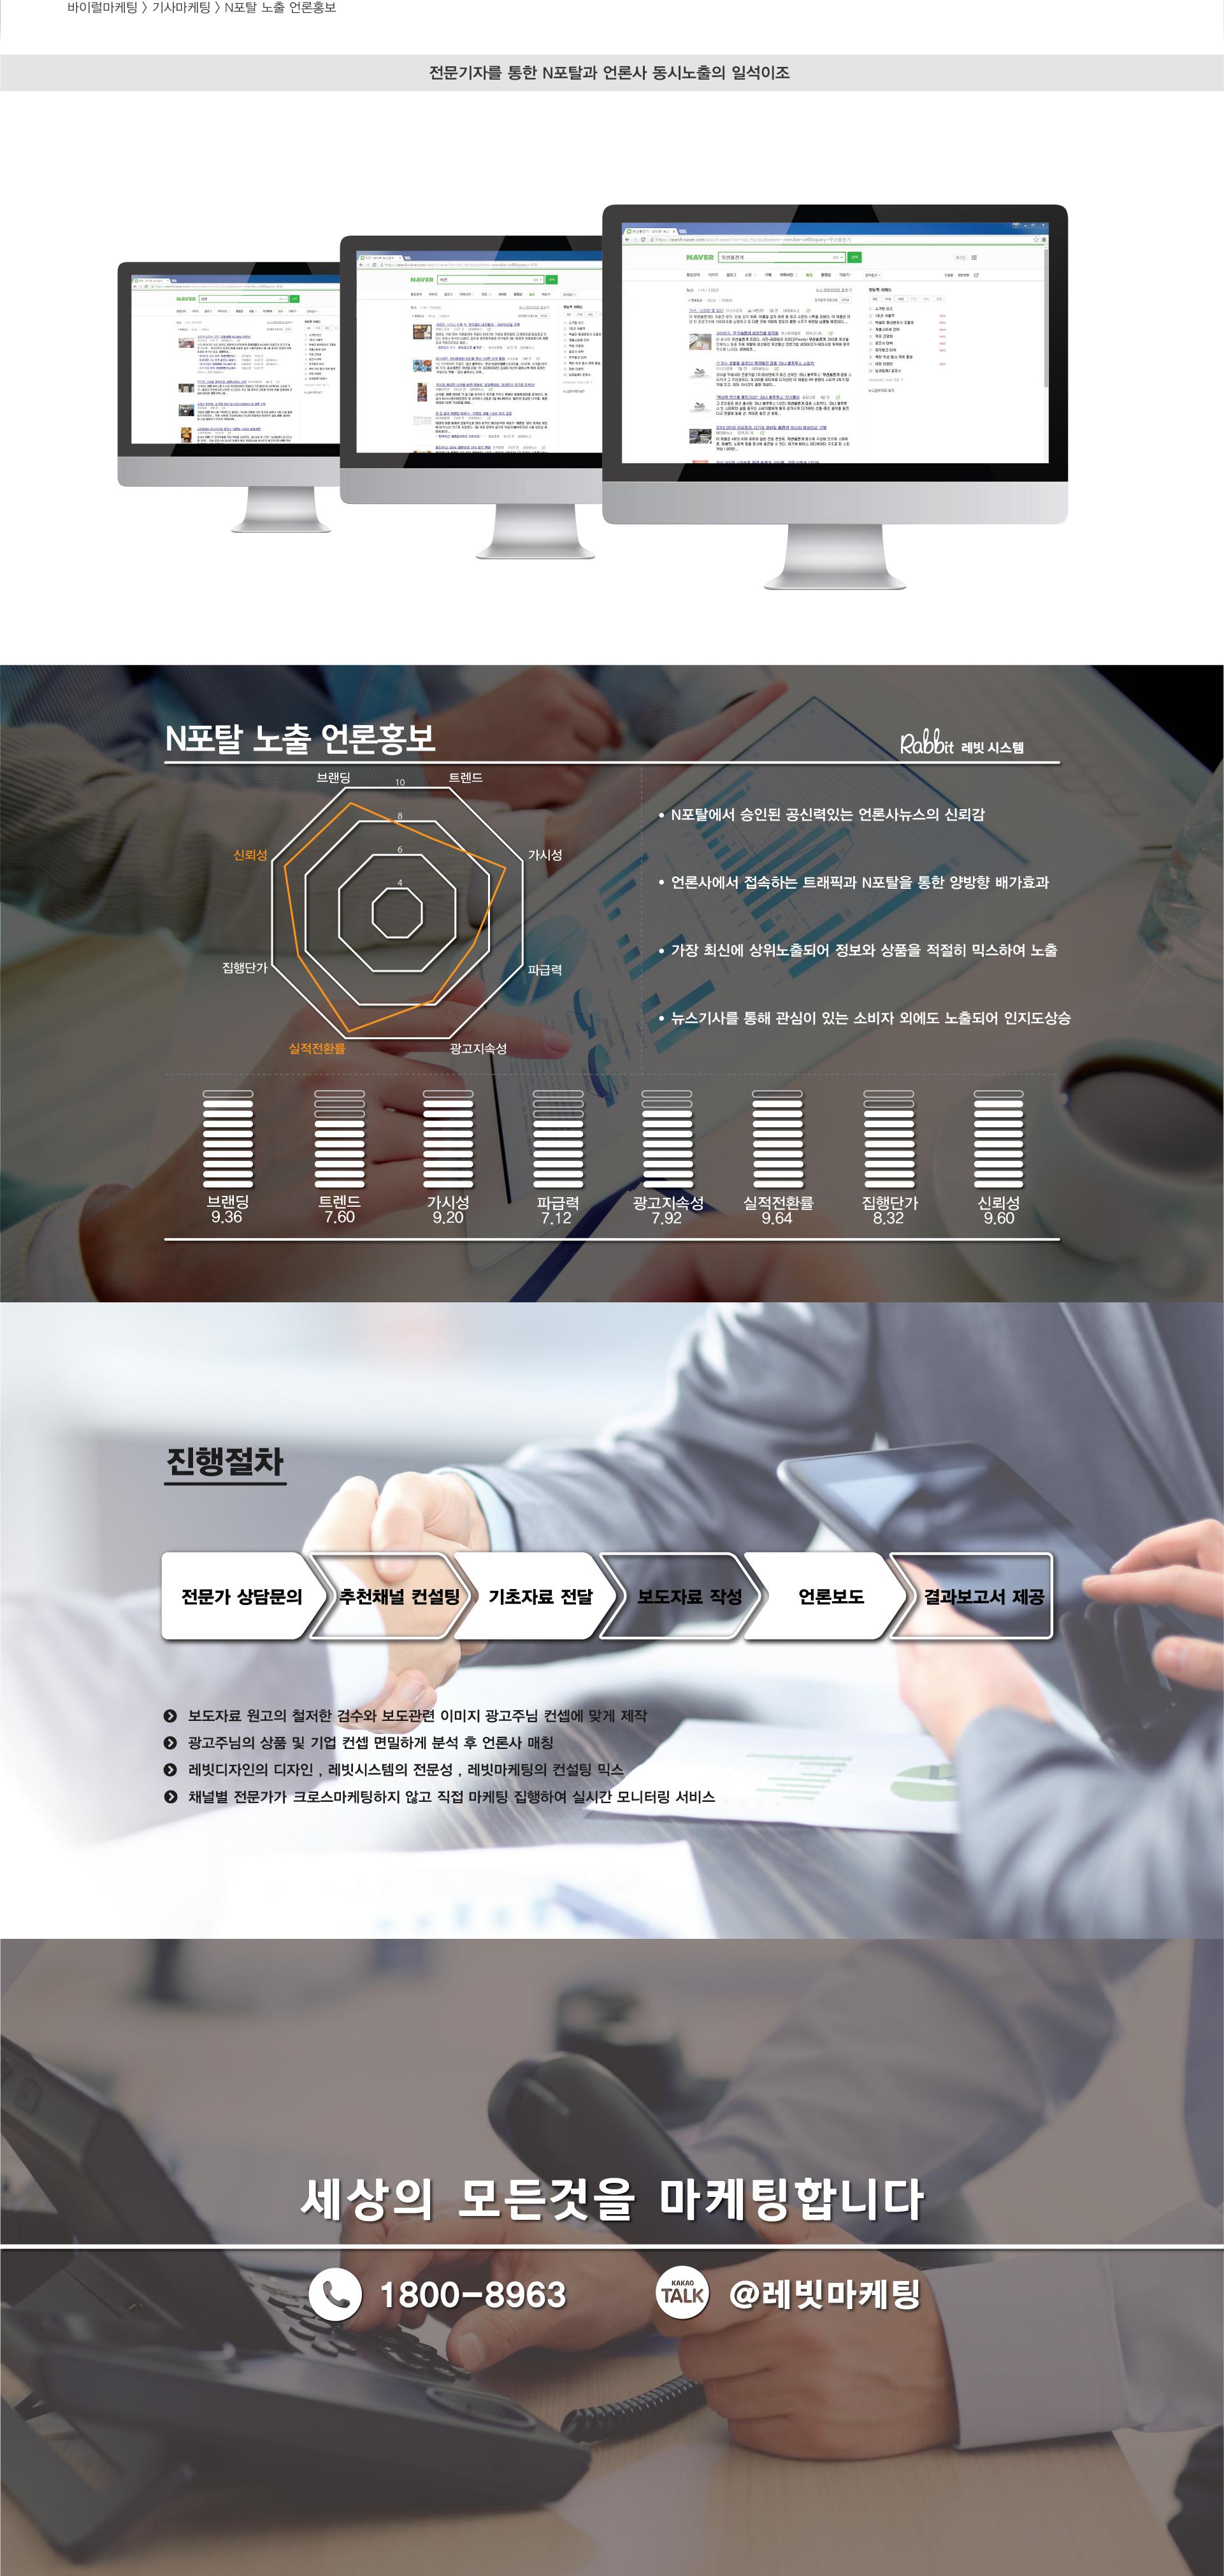 N포탈 노출 언론홍보-01